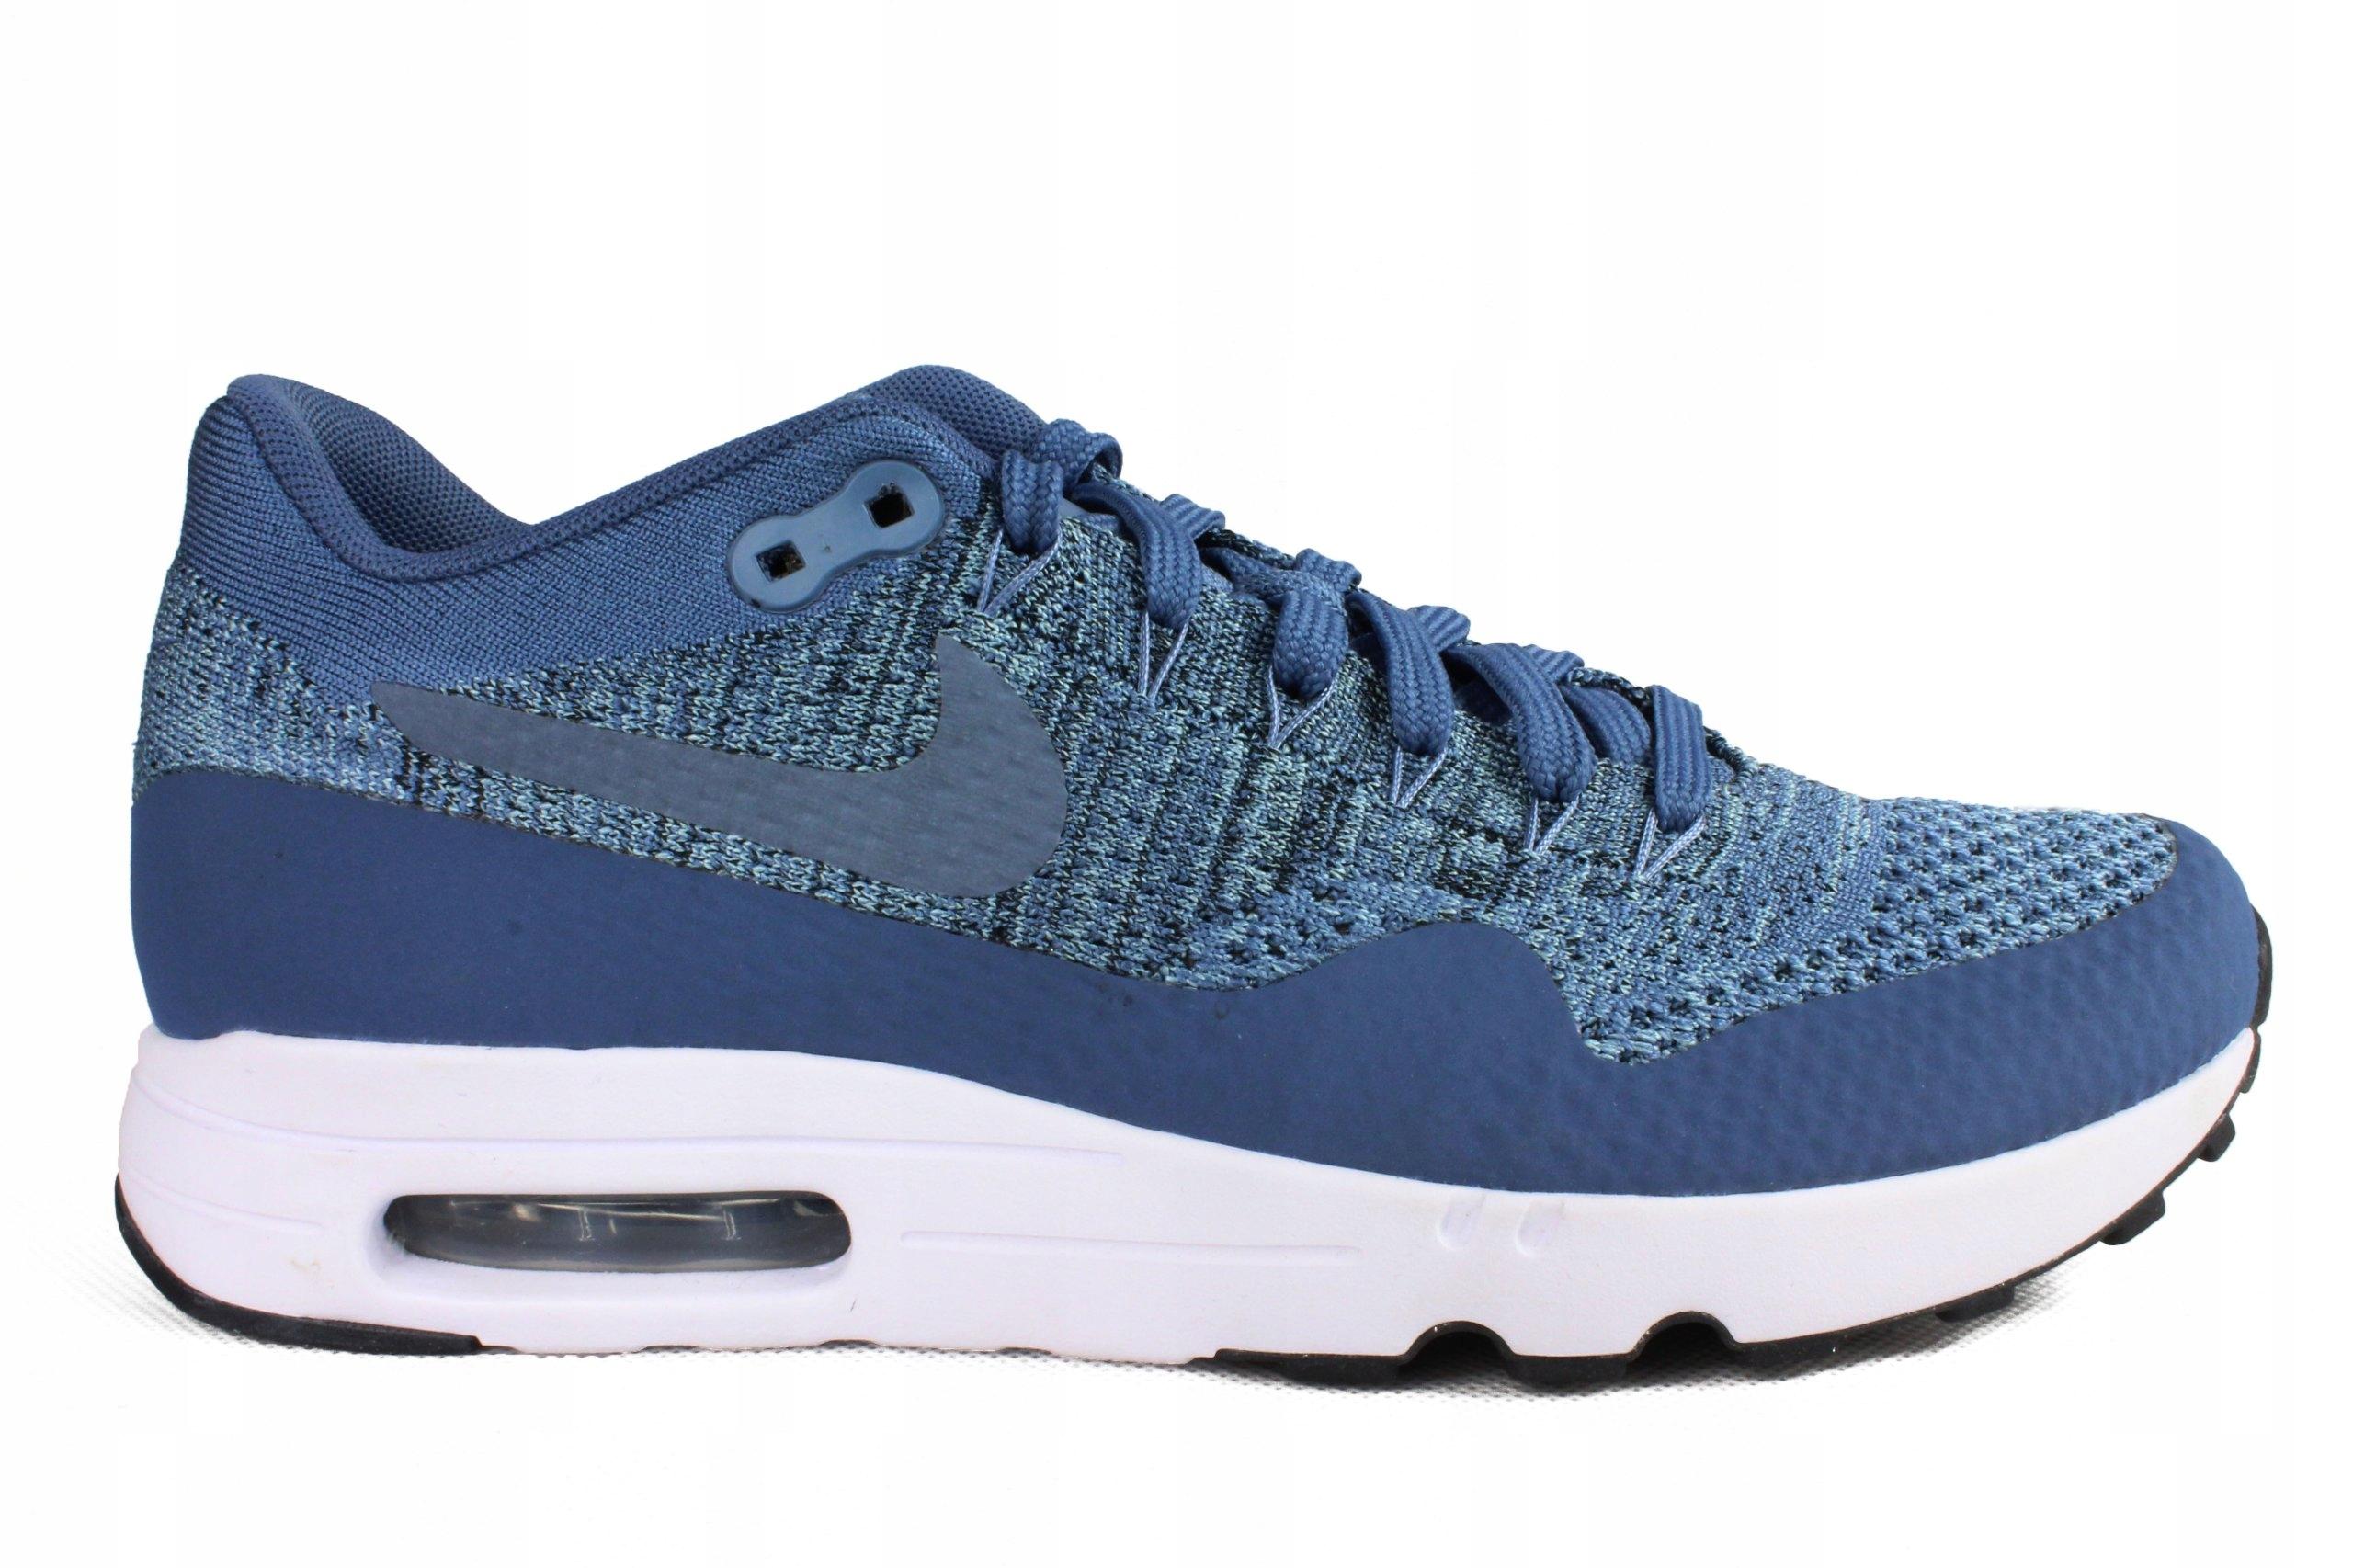 Nike Air Max 1 Ultra 2.0 Flyknit sneaker 875942 400